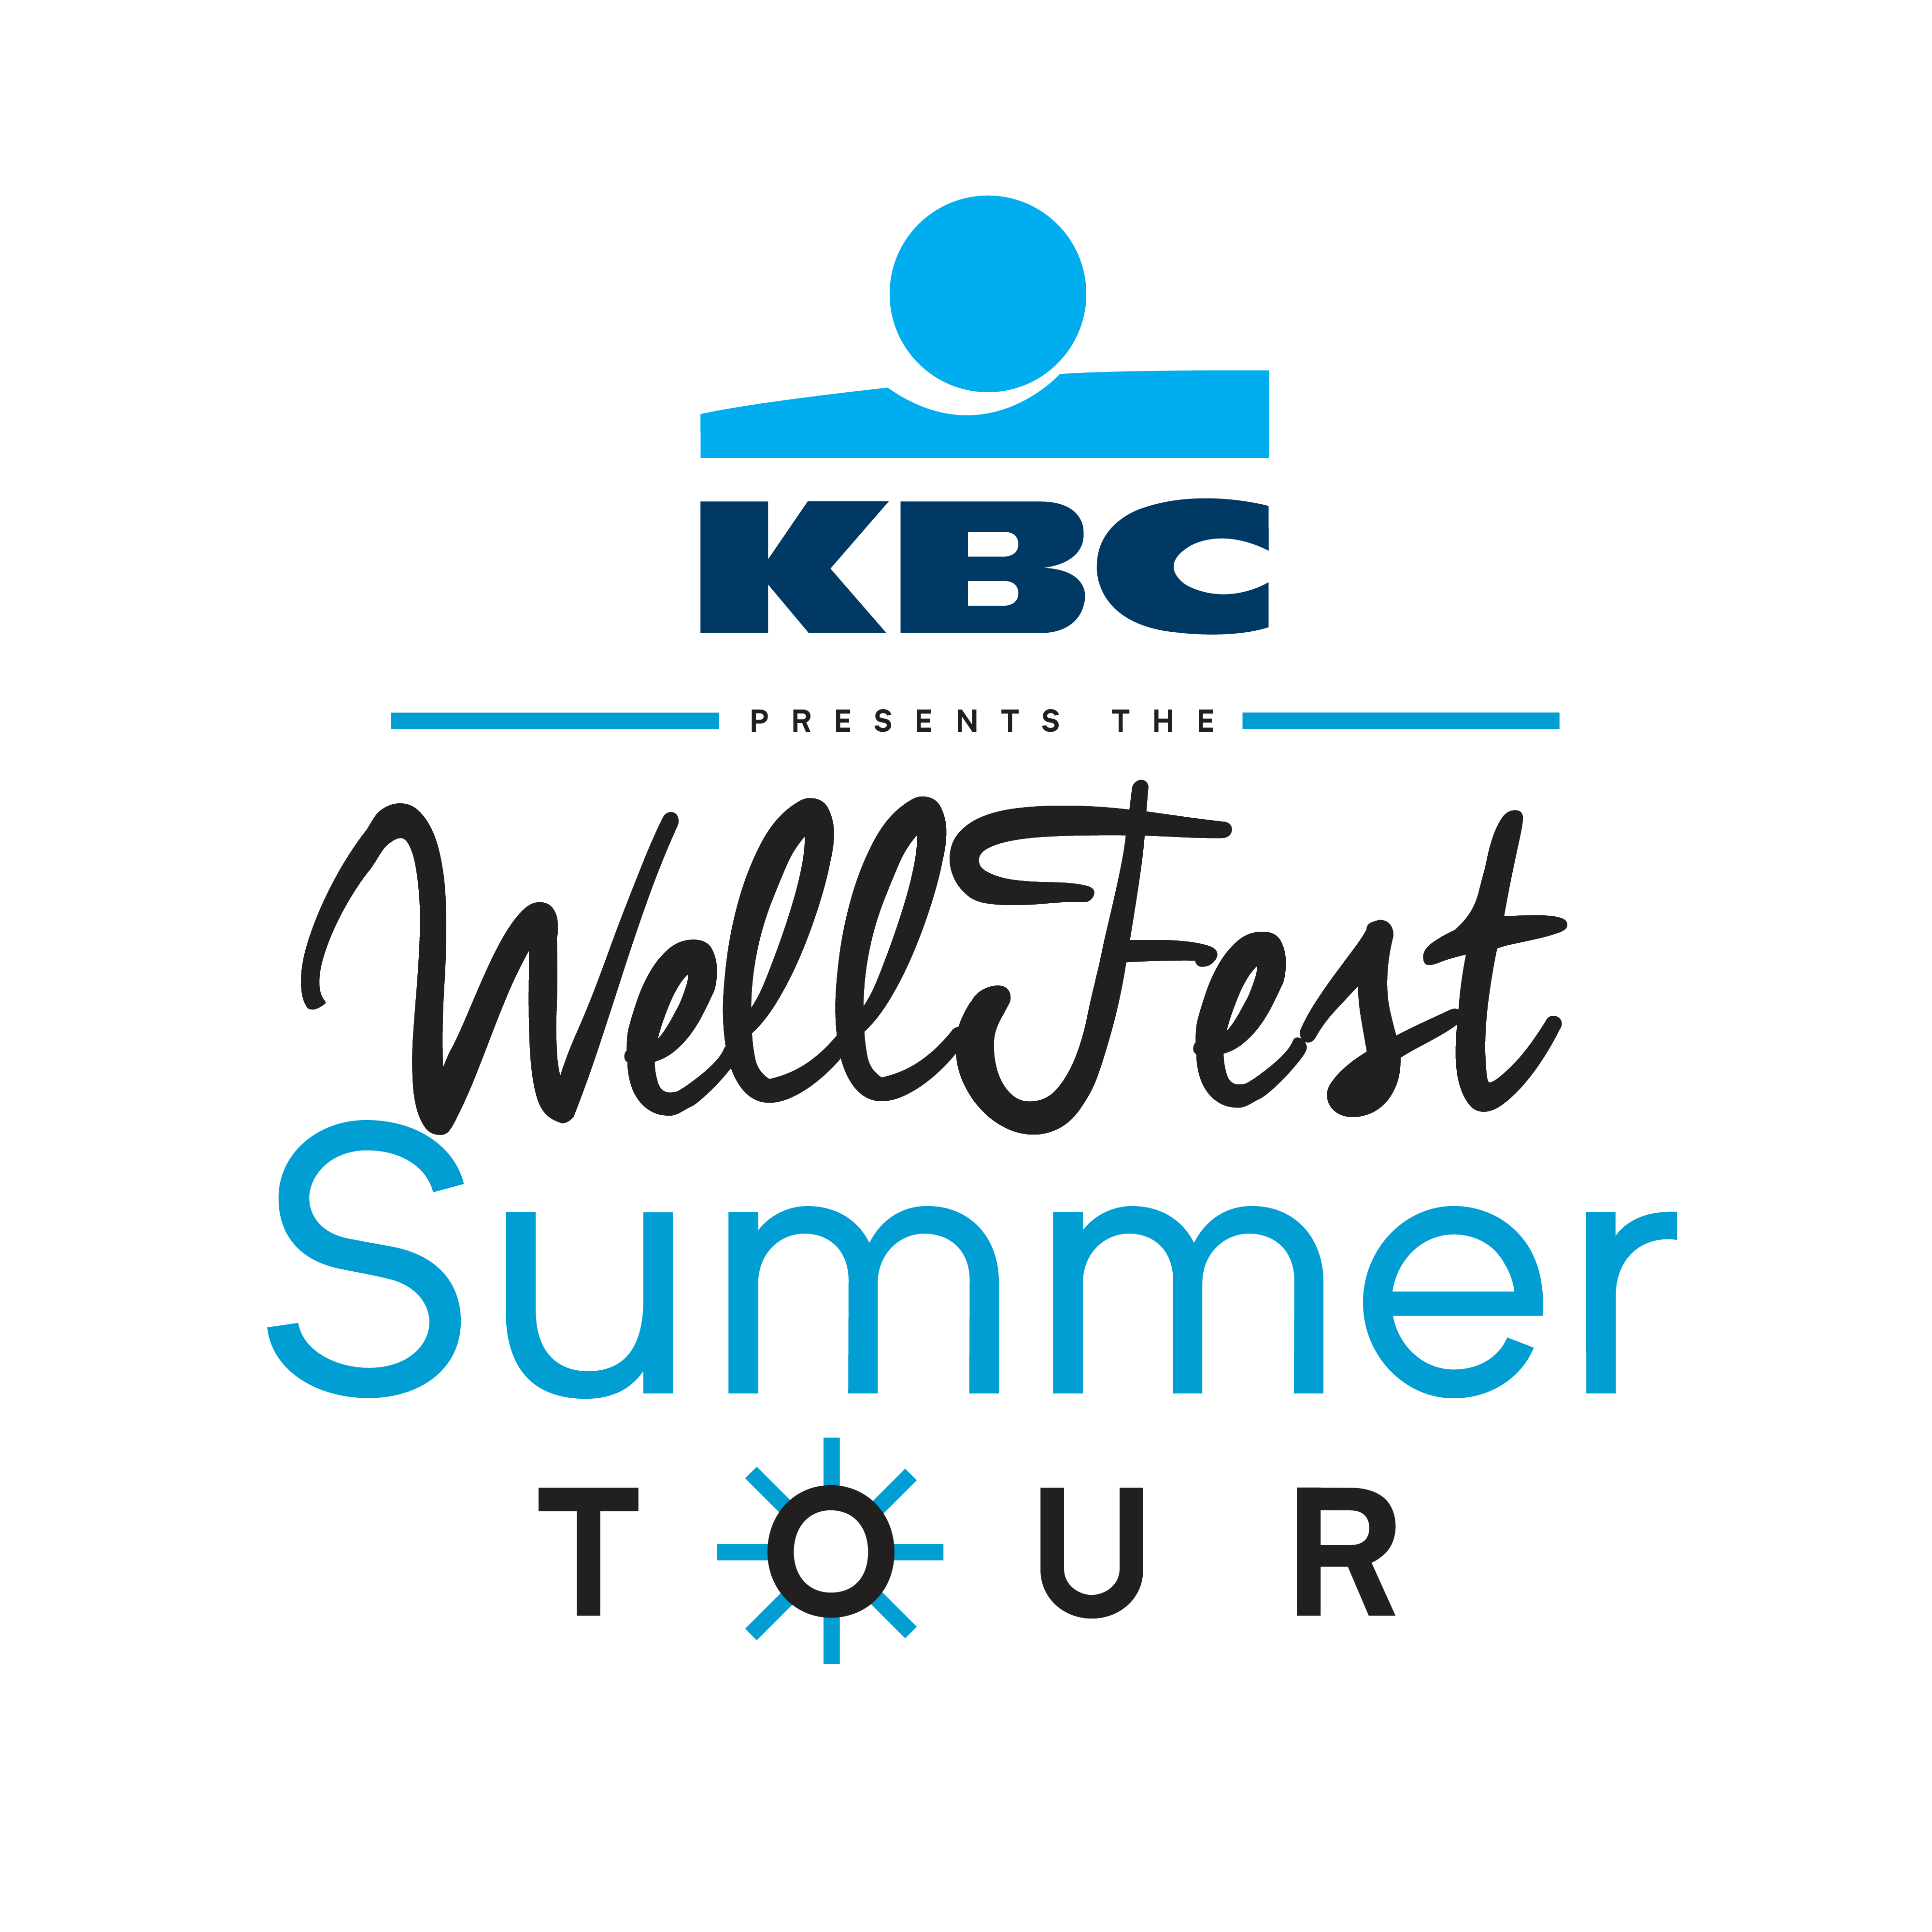 Galway - KBC presents the WellFest Summer Tour